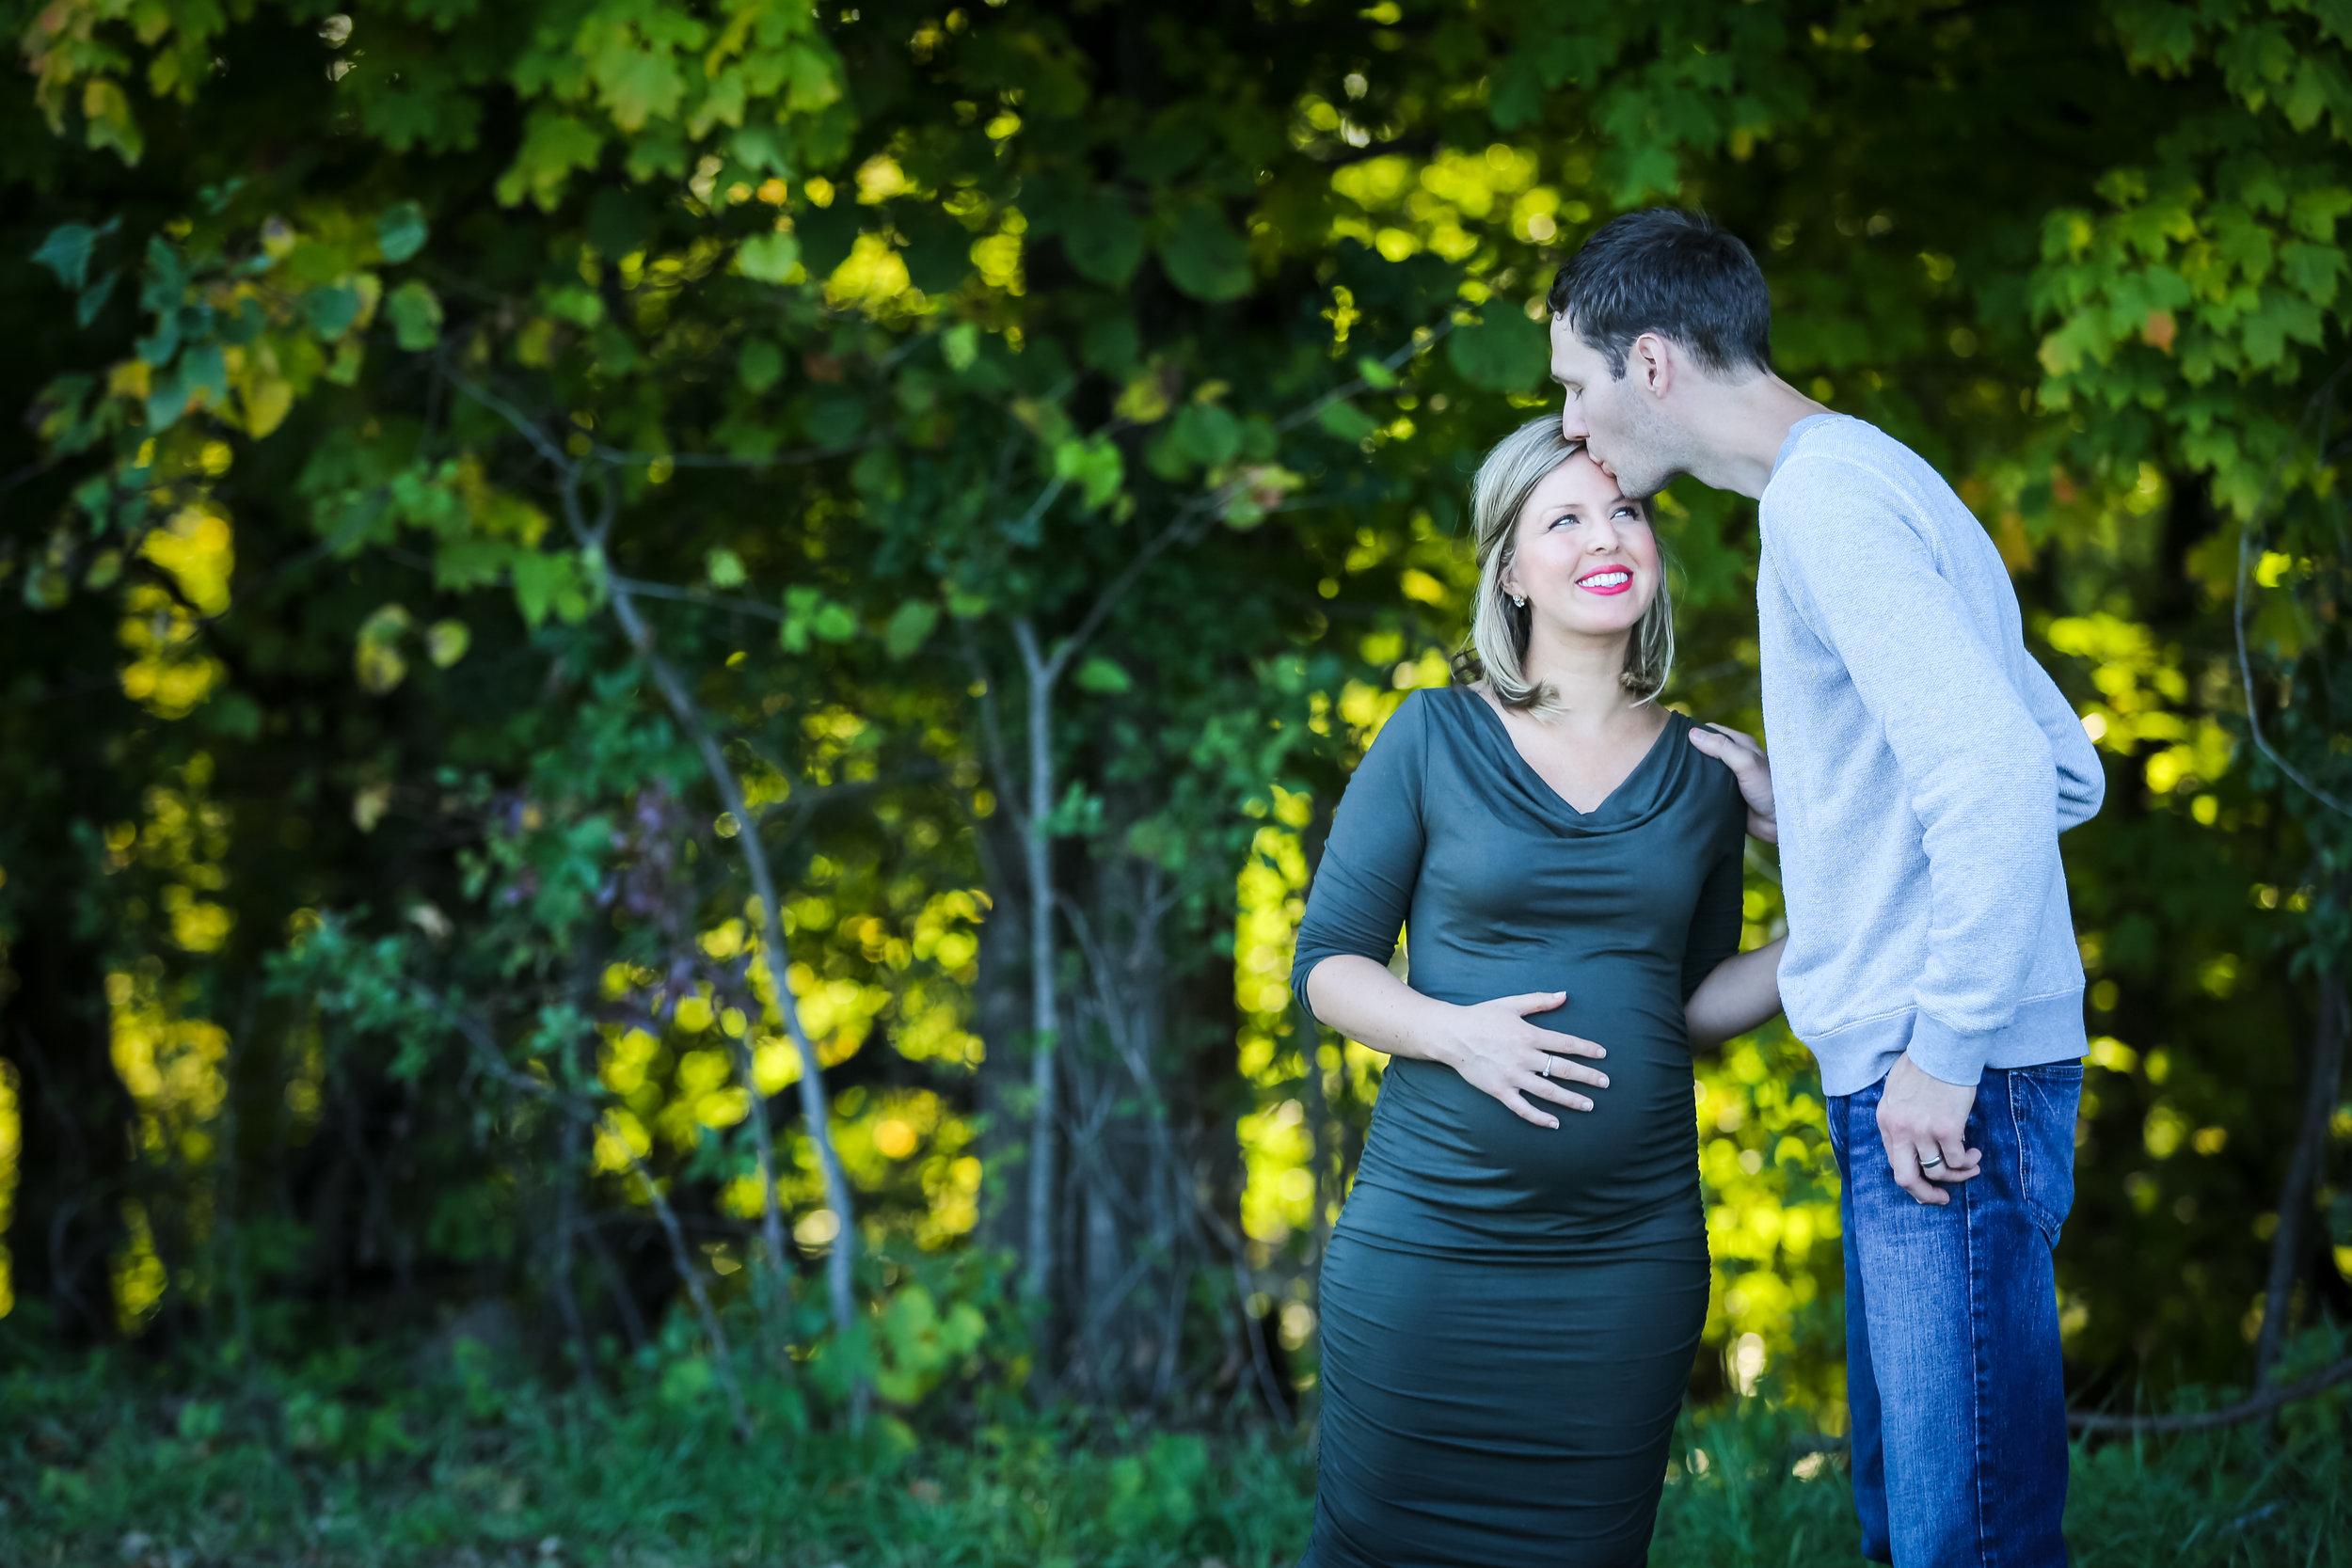 20161002EmmaandJake - Maternity 2016-205.JPG